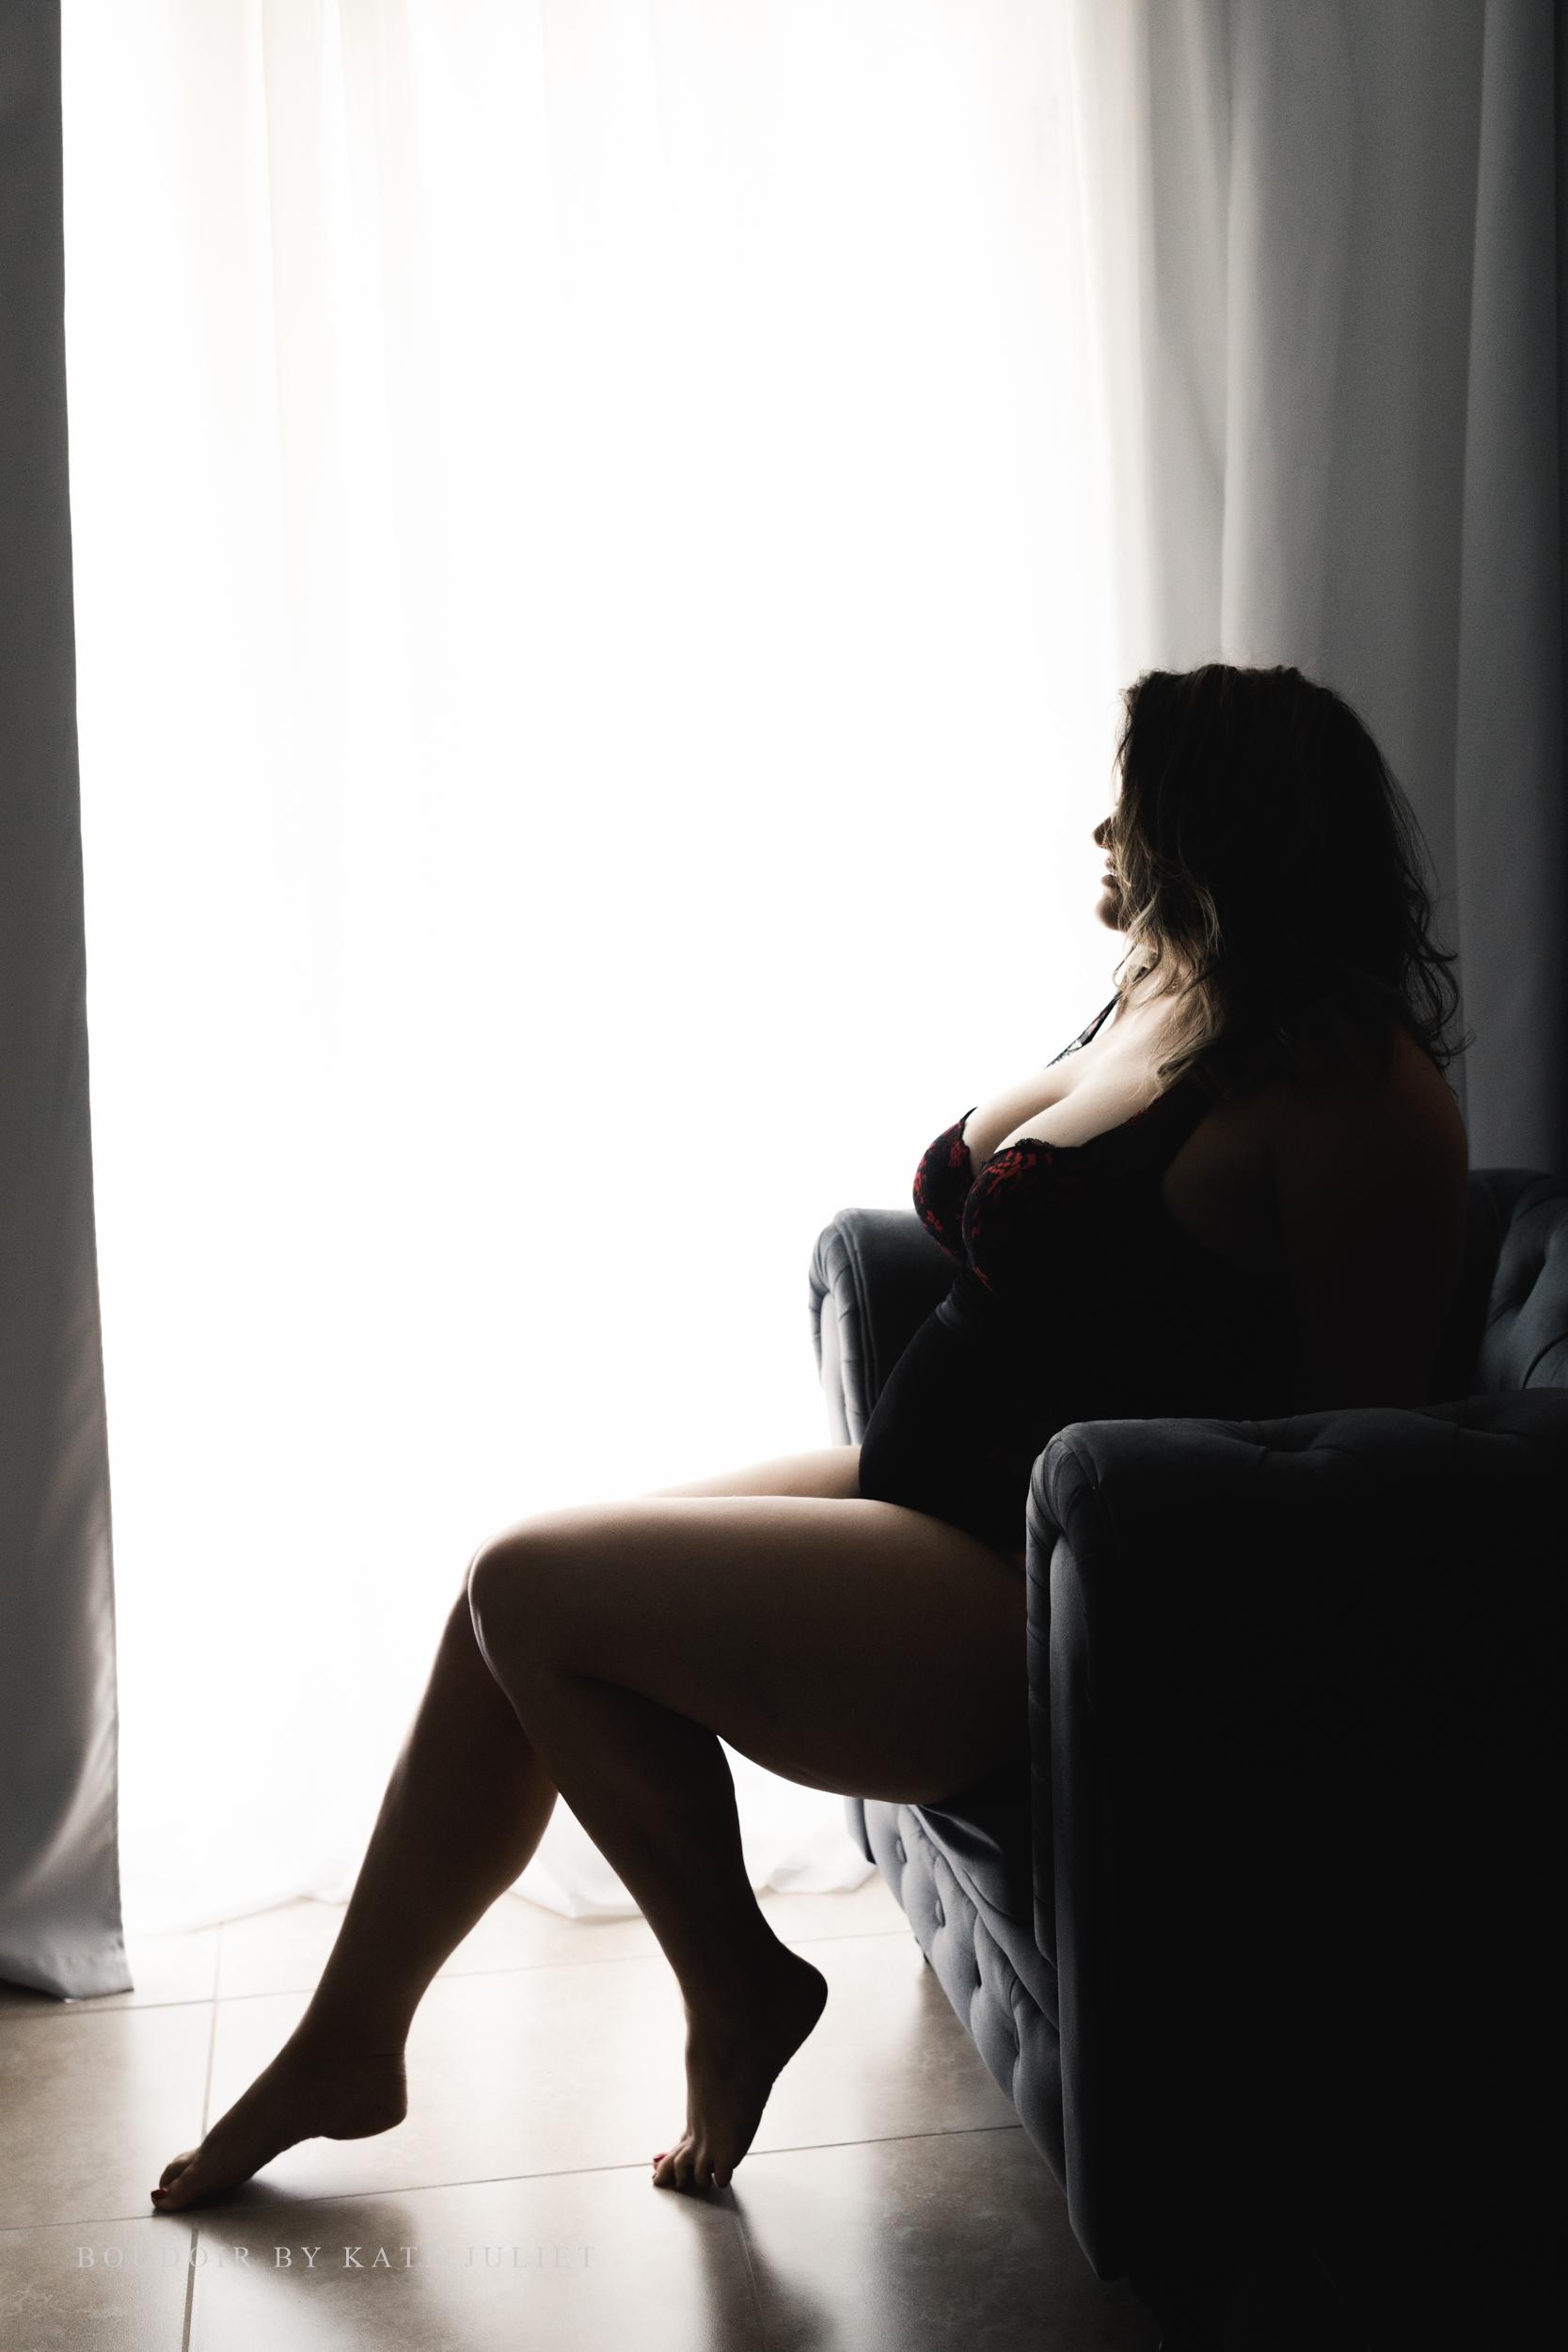 kate juliet photography - boudoir - web-99.jpg